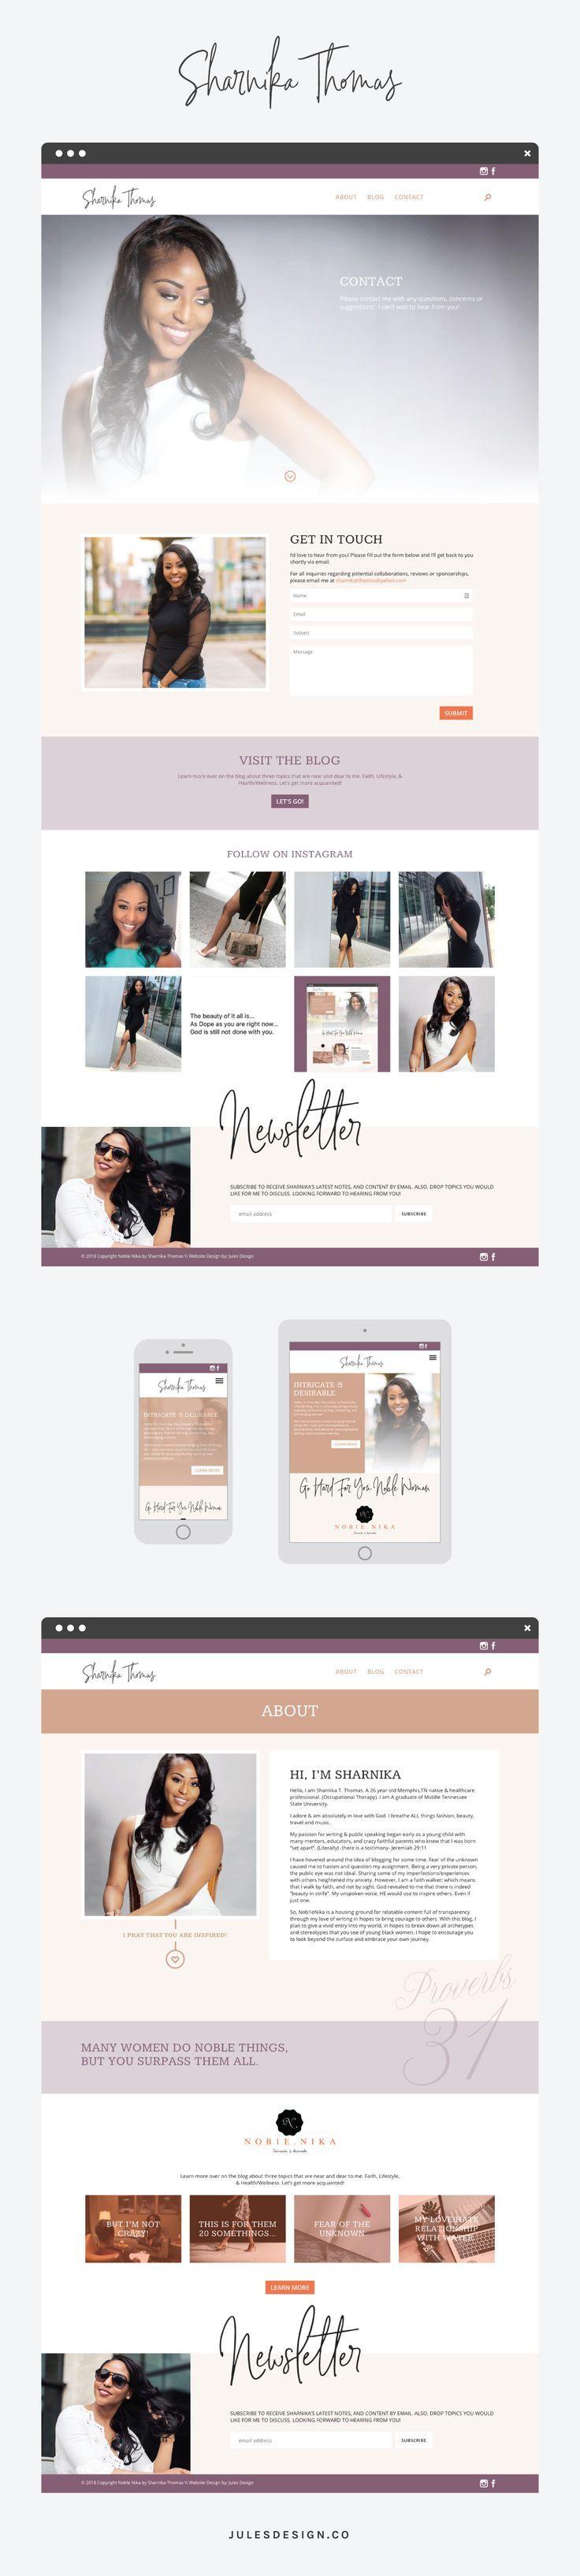 Sharnika Thomas Jules Design Wordpress Website Design Web Development Design Feminine Website Design